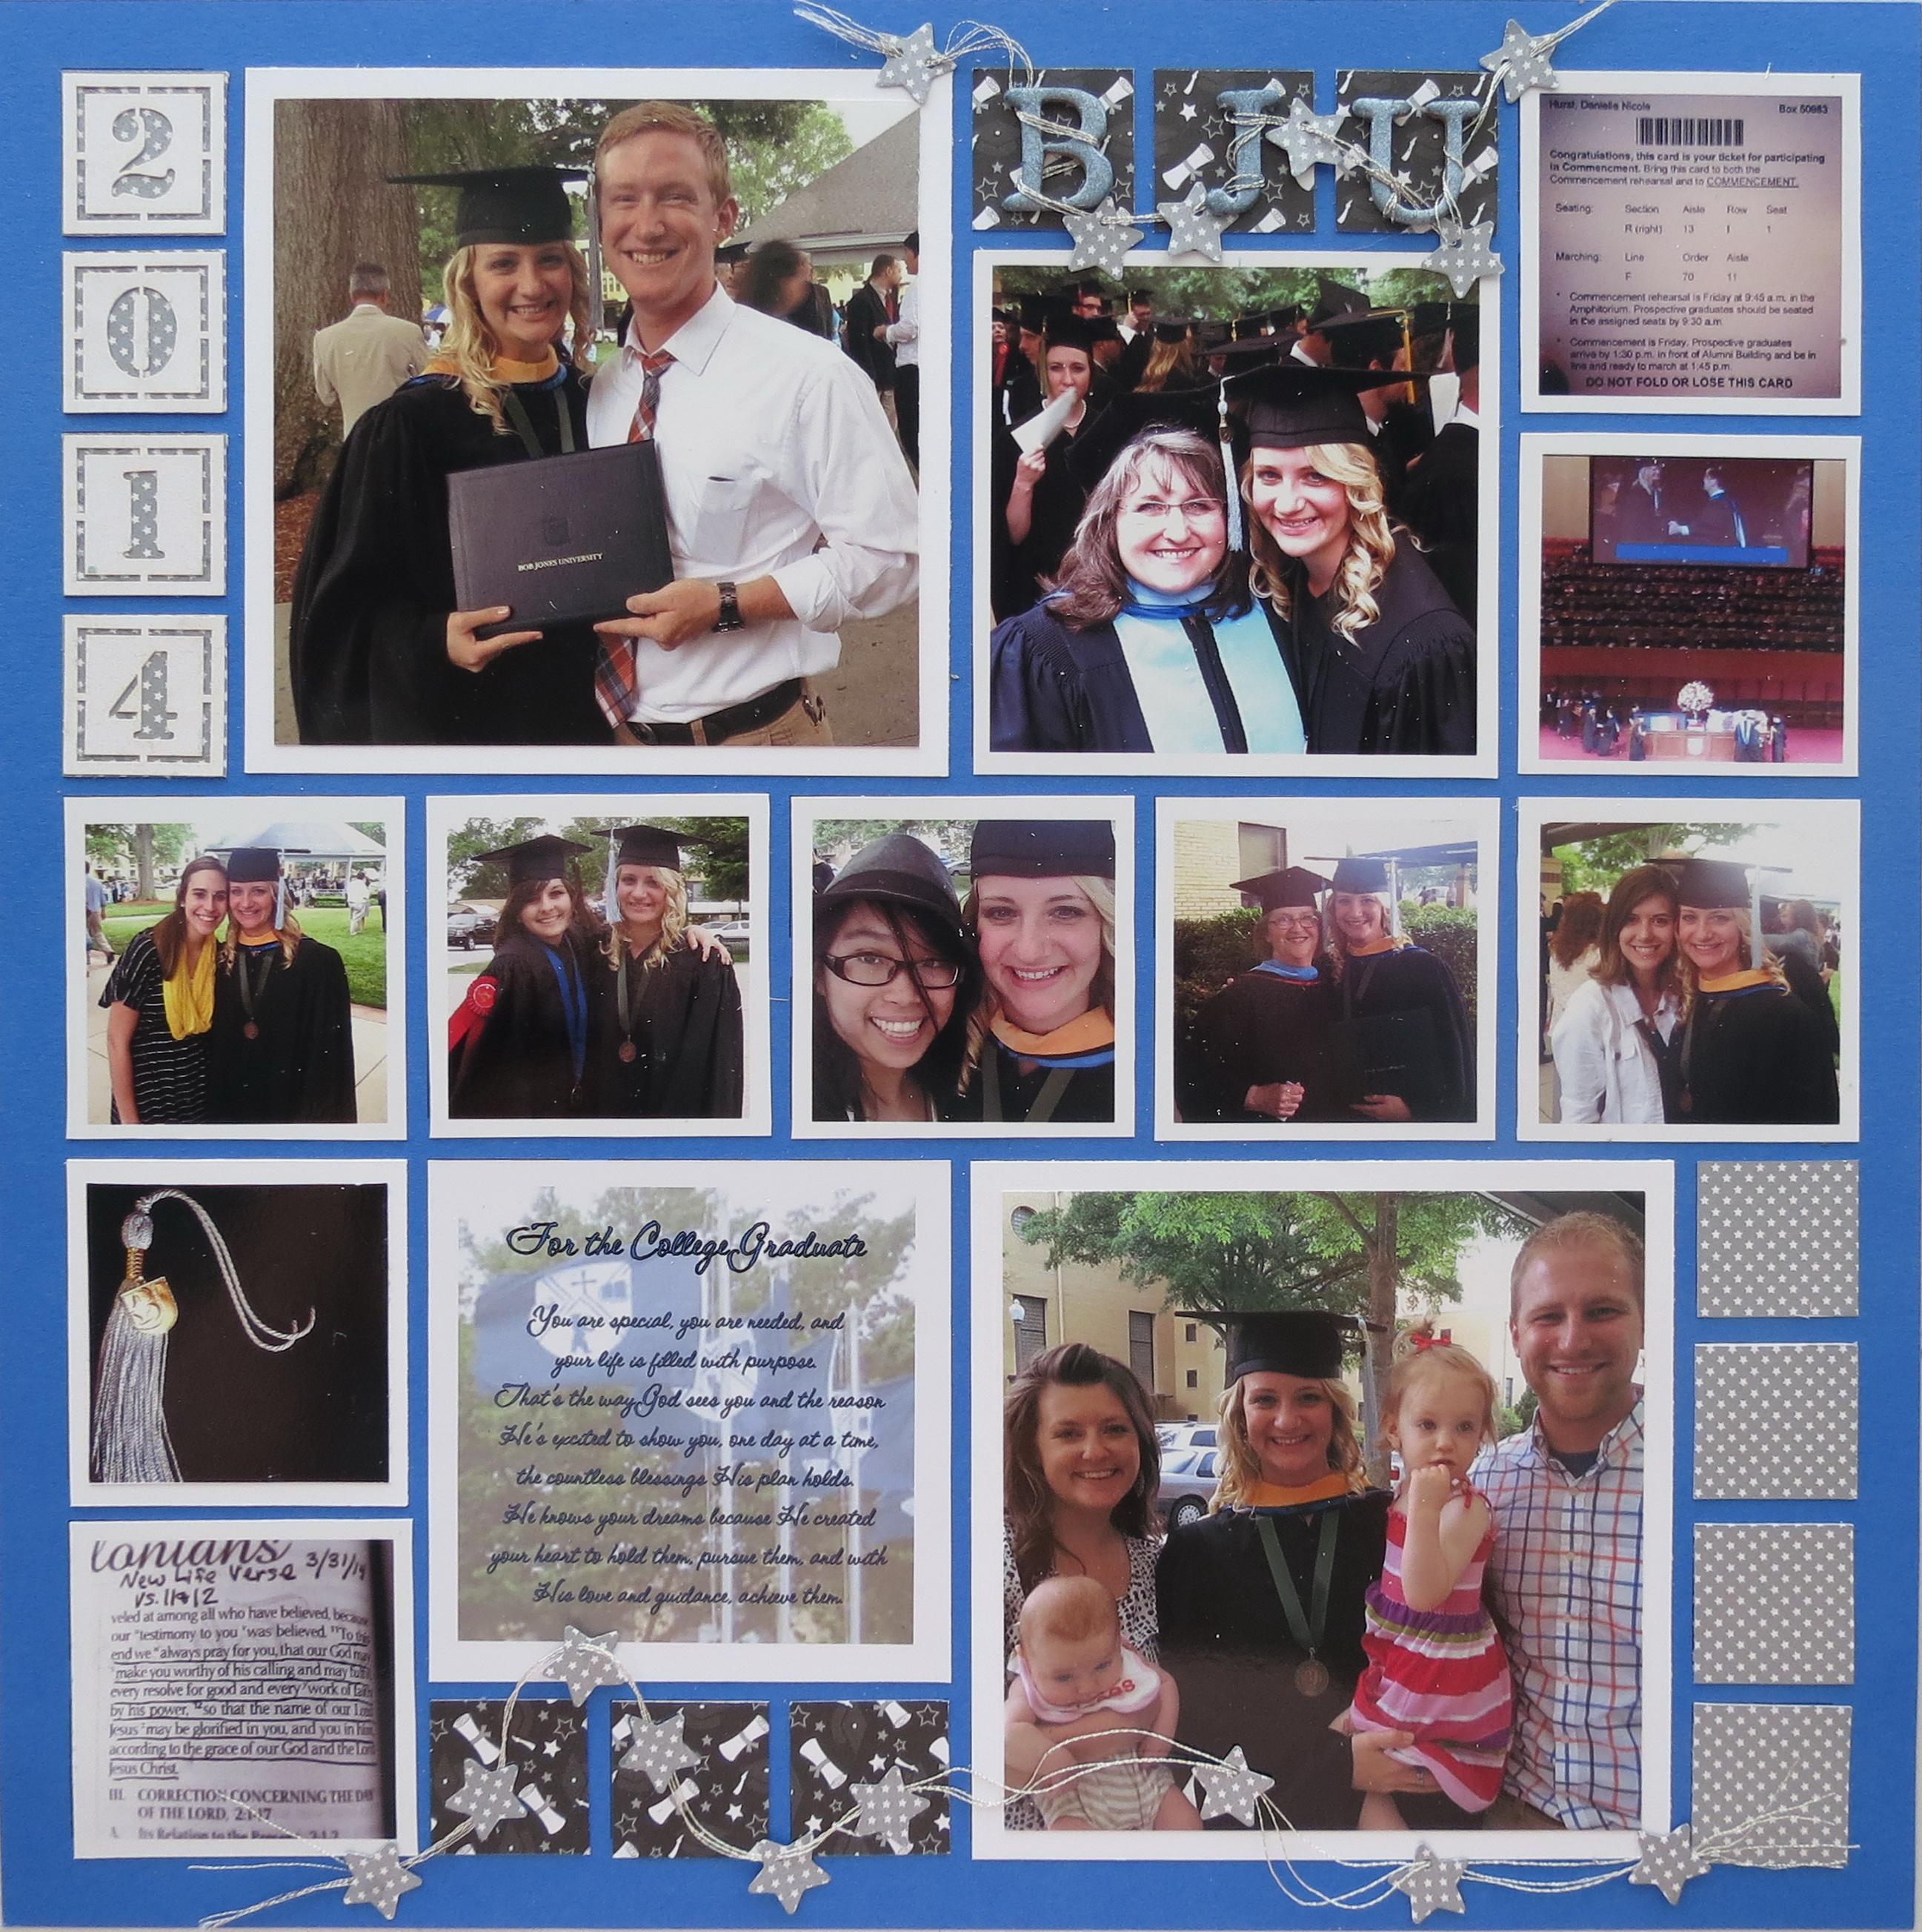 Danielle s graduation